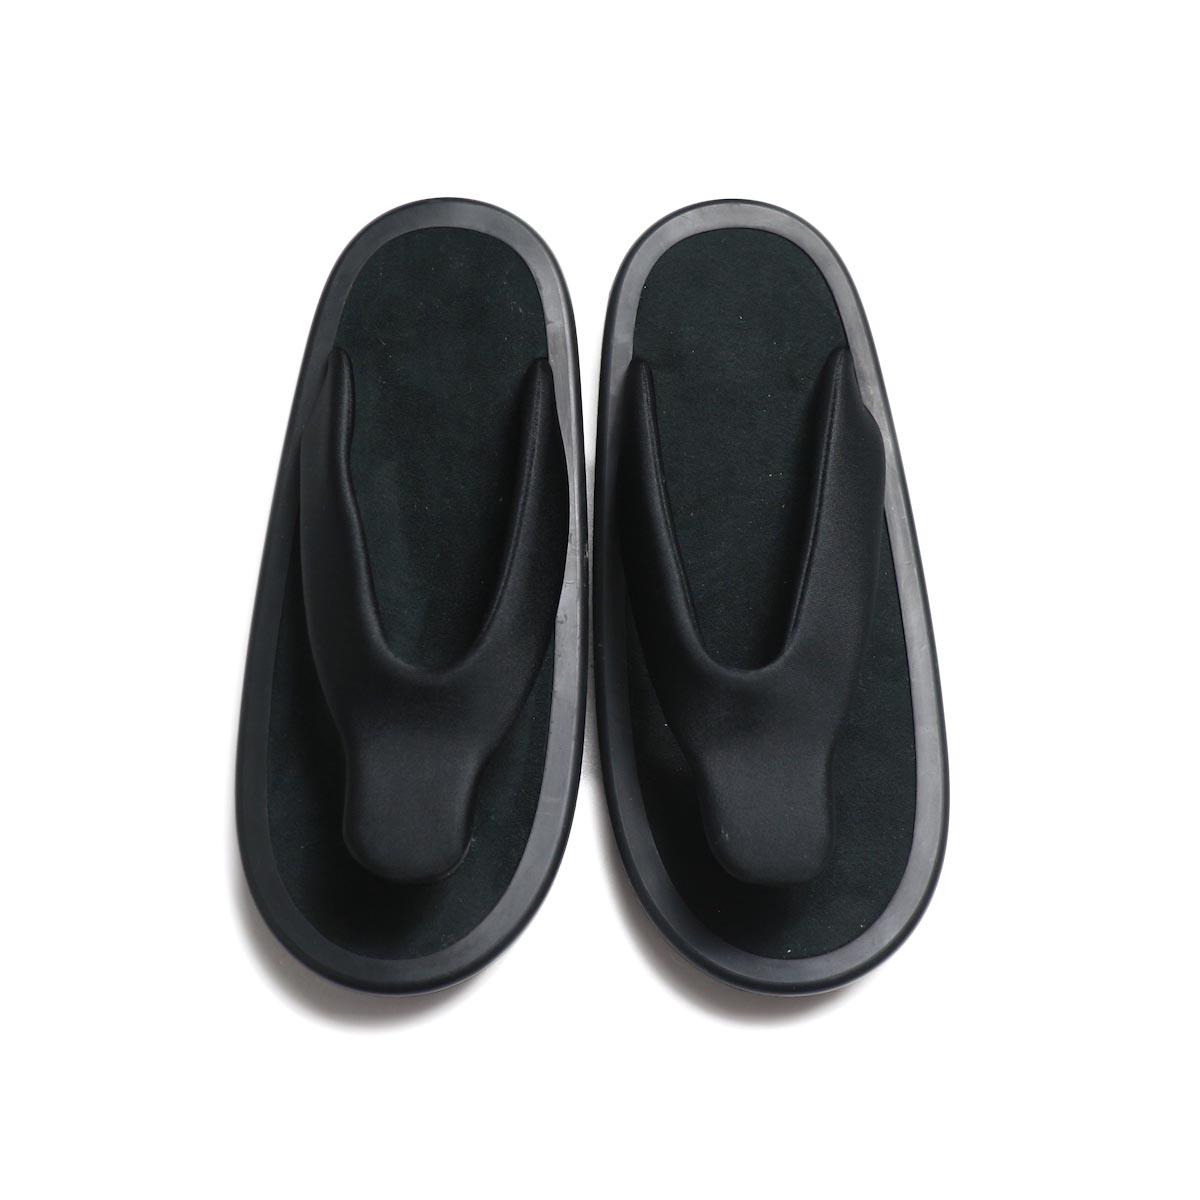 JOJO / Beach Sandal -Black (Black Suede)正面